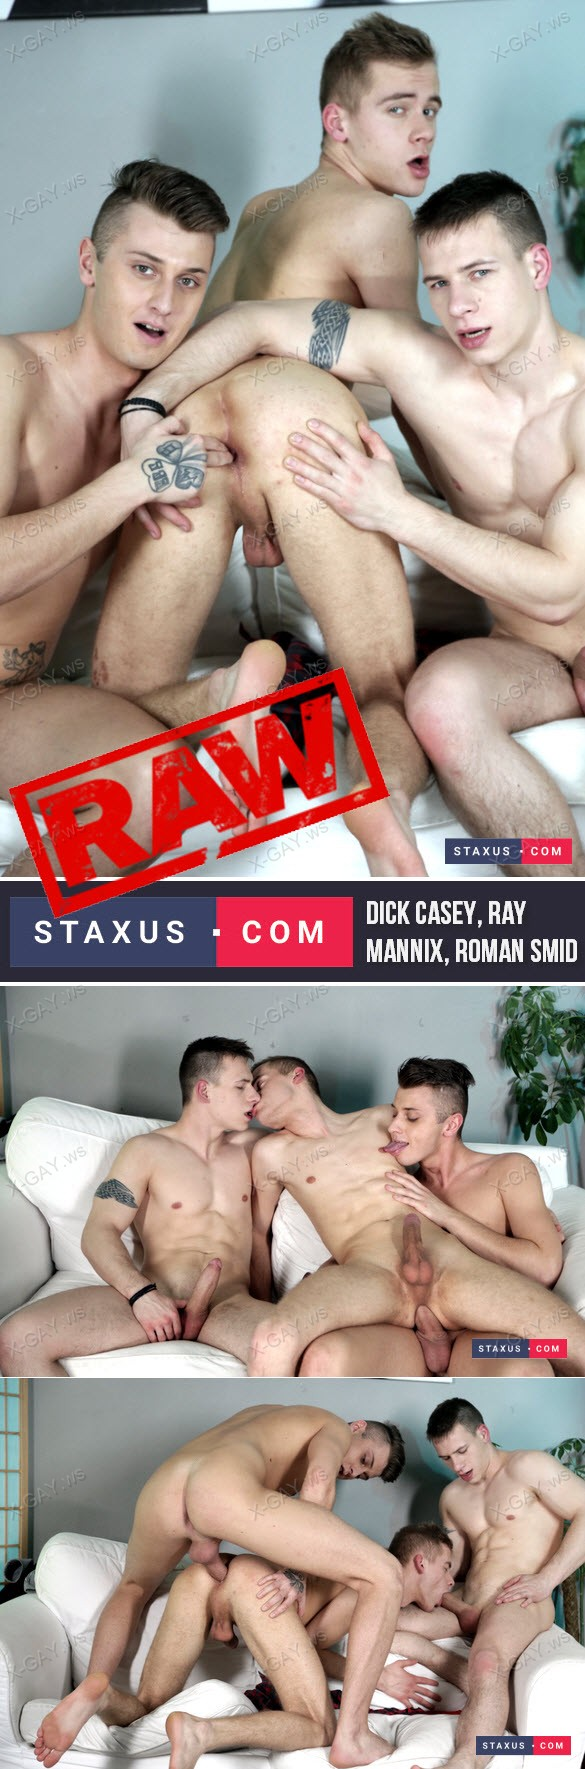 Staxus – Dick Casey, Ray Mannix & Roman Smid, Bareback